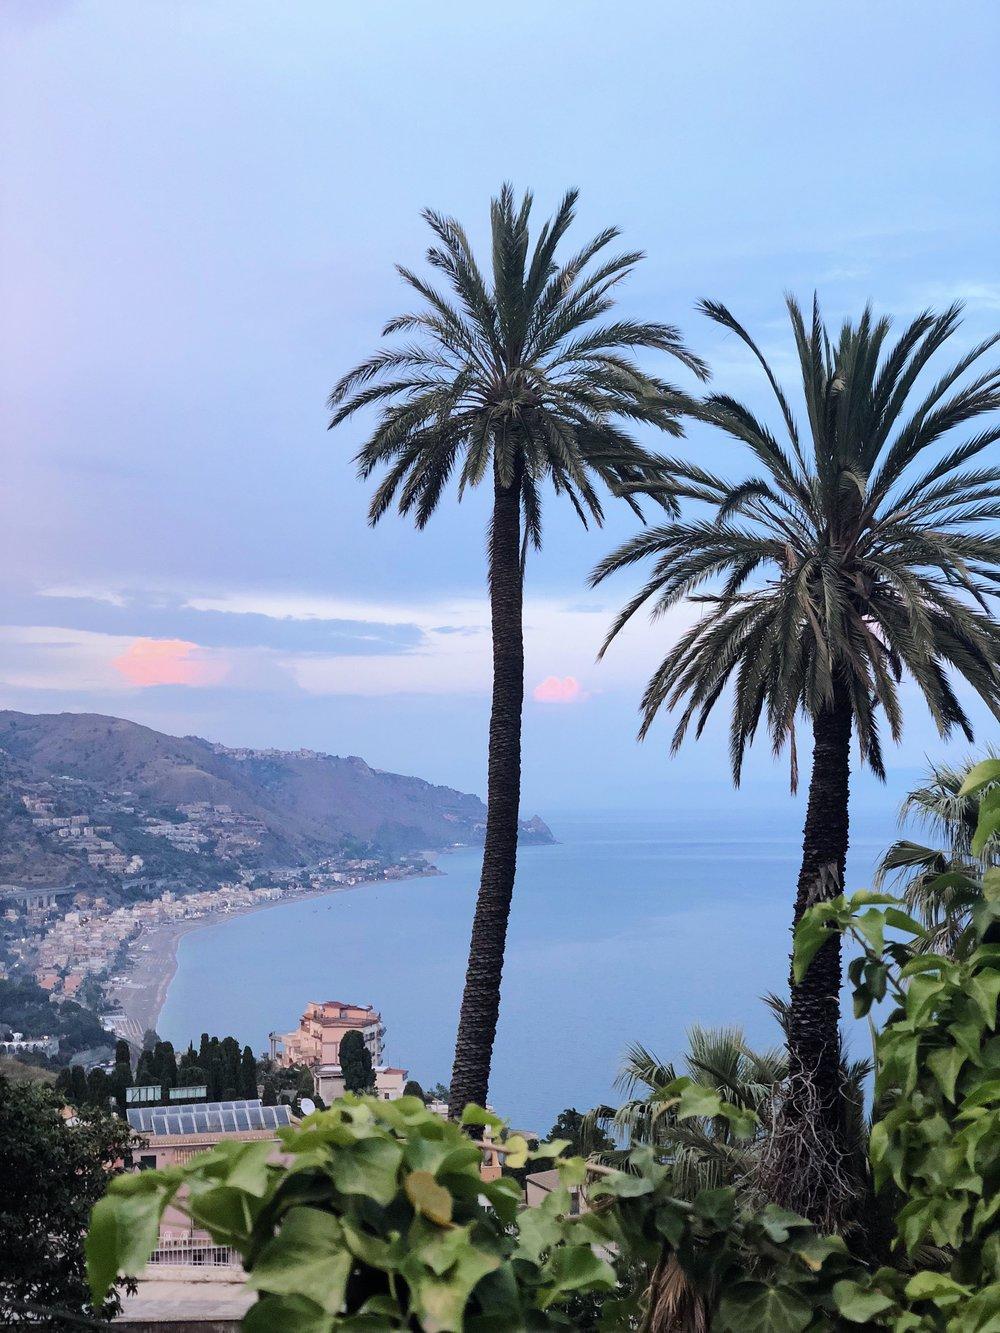 View of Taormina, Sicily